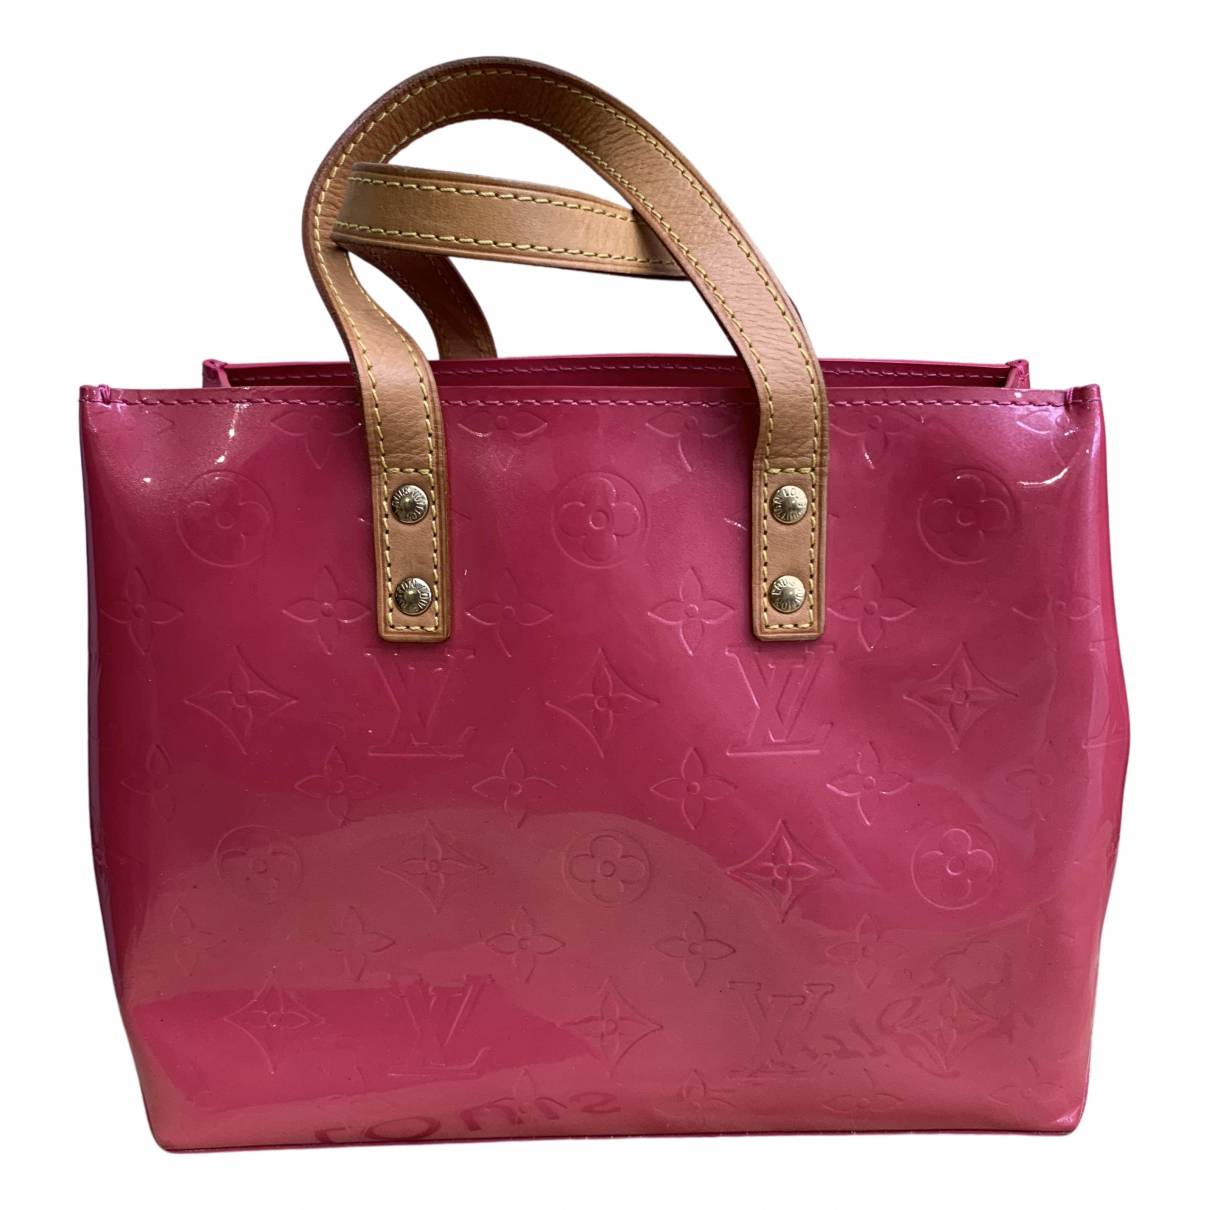 Louis Vuitton Reade Handtasche in  Rosa Lackleder